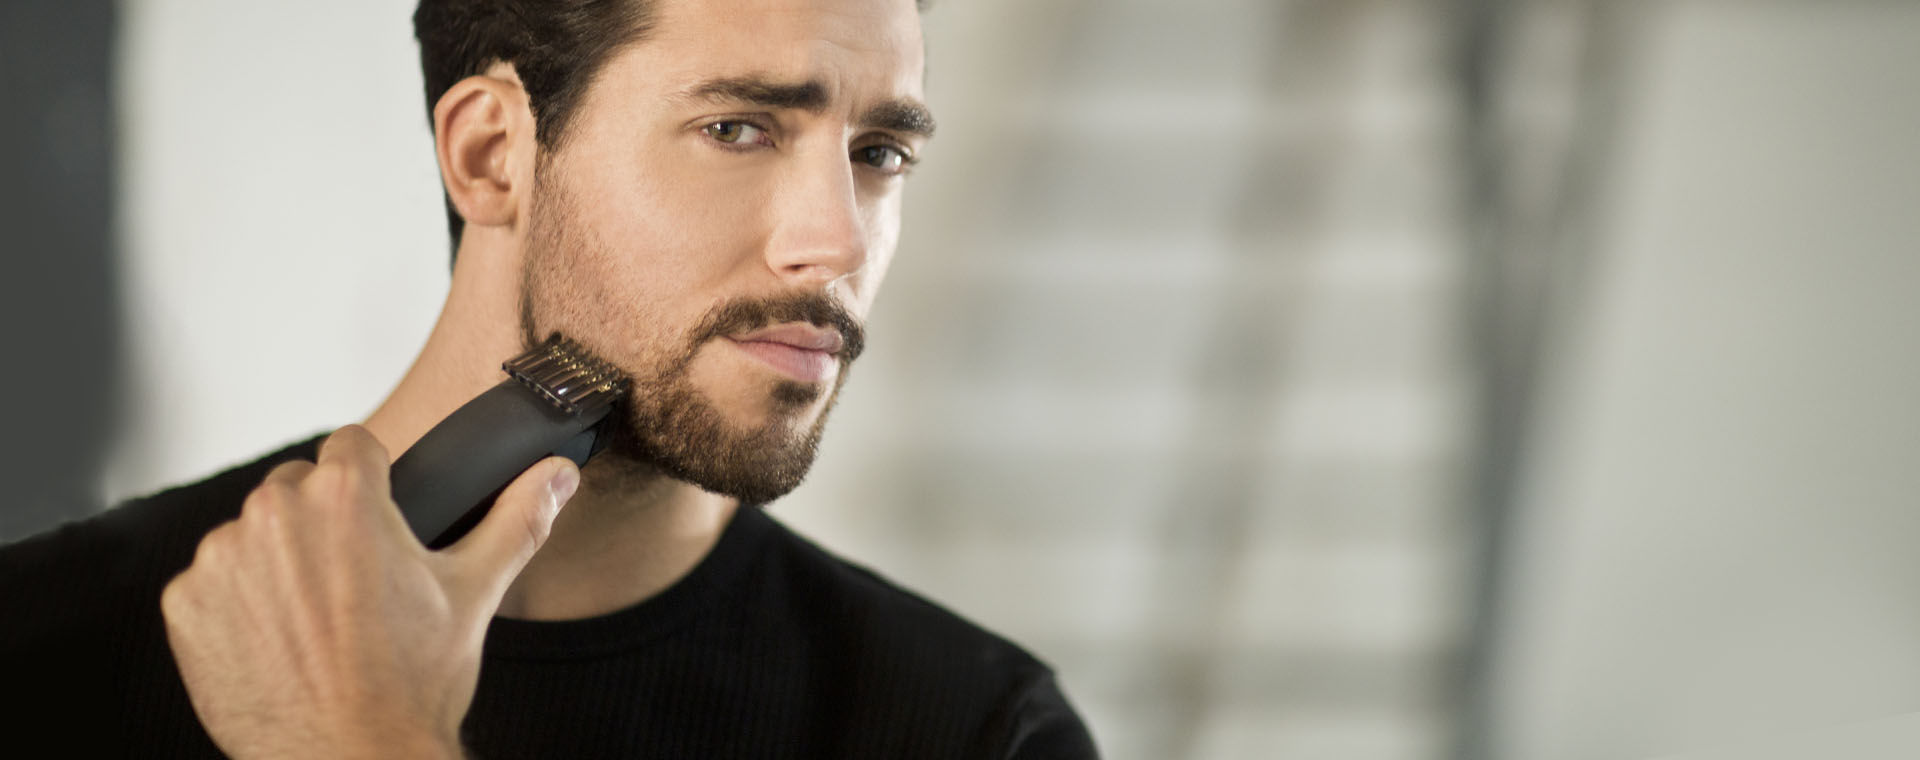 beard boss beard trimmer mb4120 remington uk. Black Bedroom Furniture Sets. Home Design Ideas